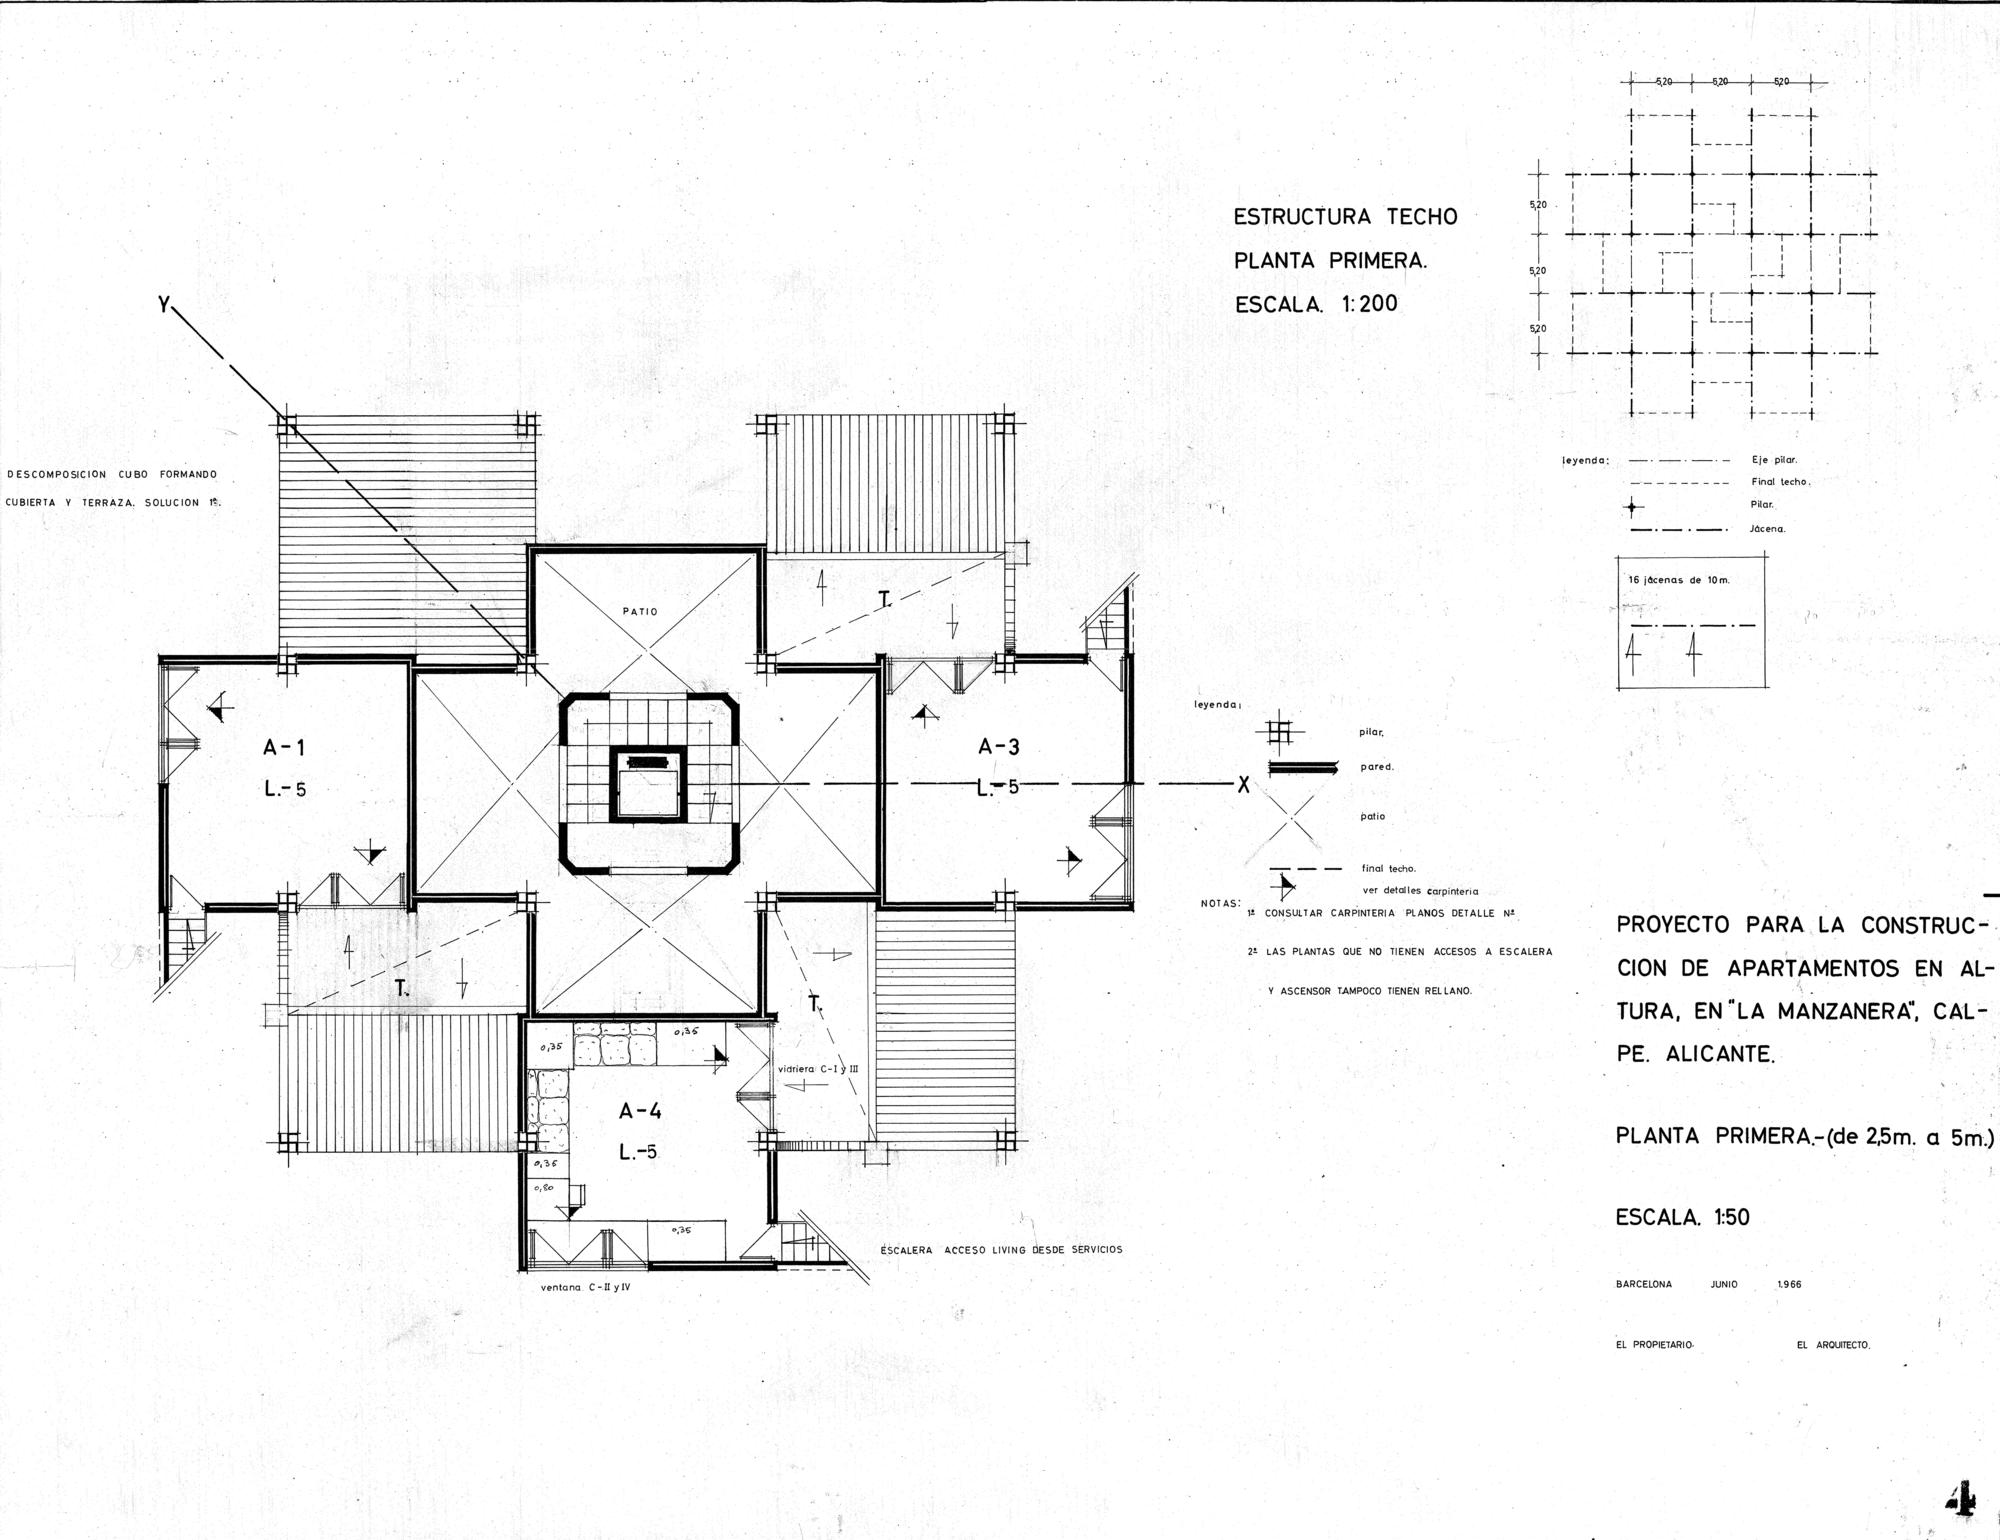 5116cff5b3fc4b0843000033_ad-classics-xanad-ricardo-bofill_xanadu_calpe_spain_ricardo_bofill_taller_arquitectura_14.png